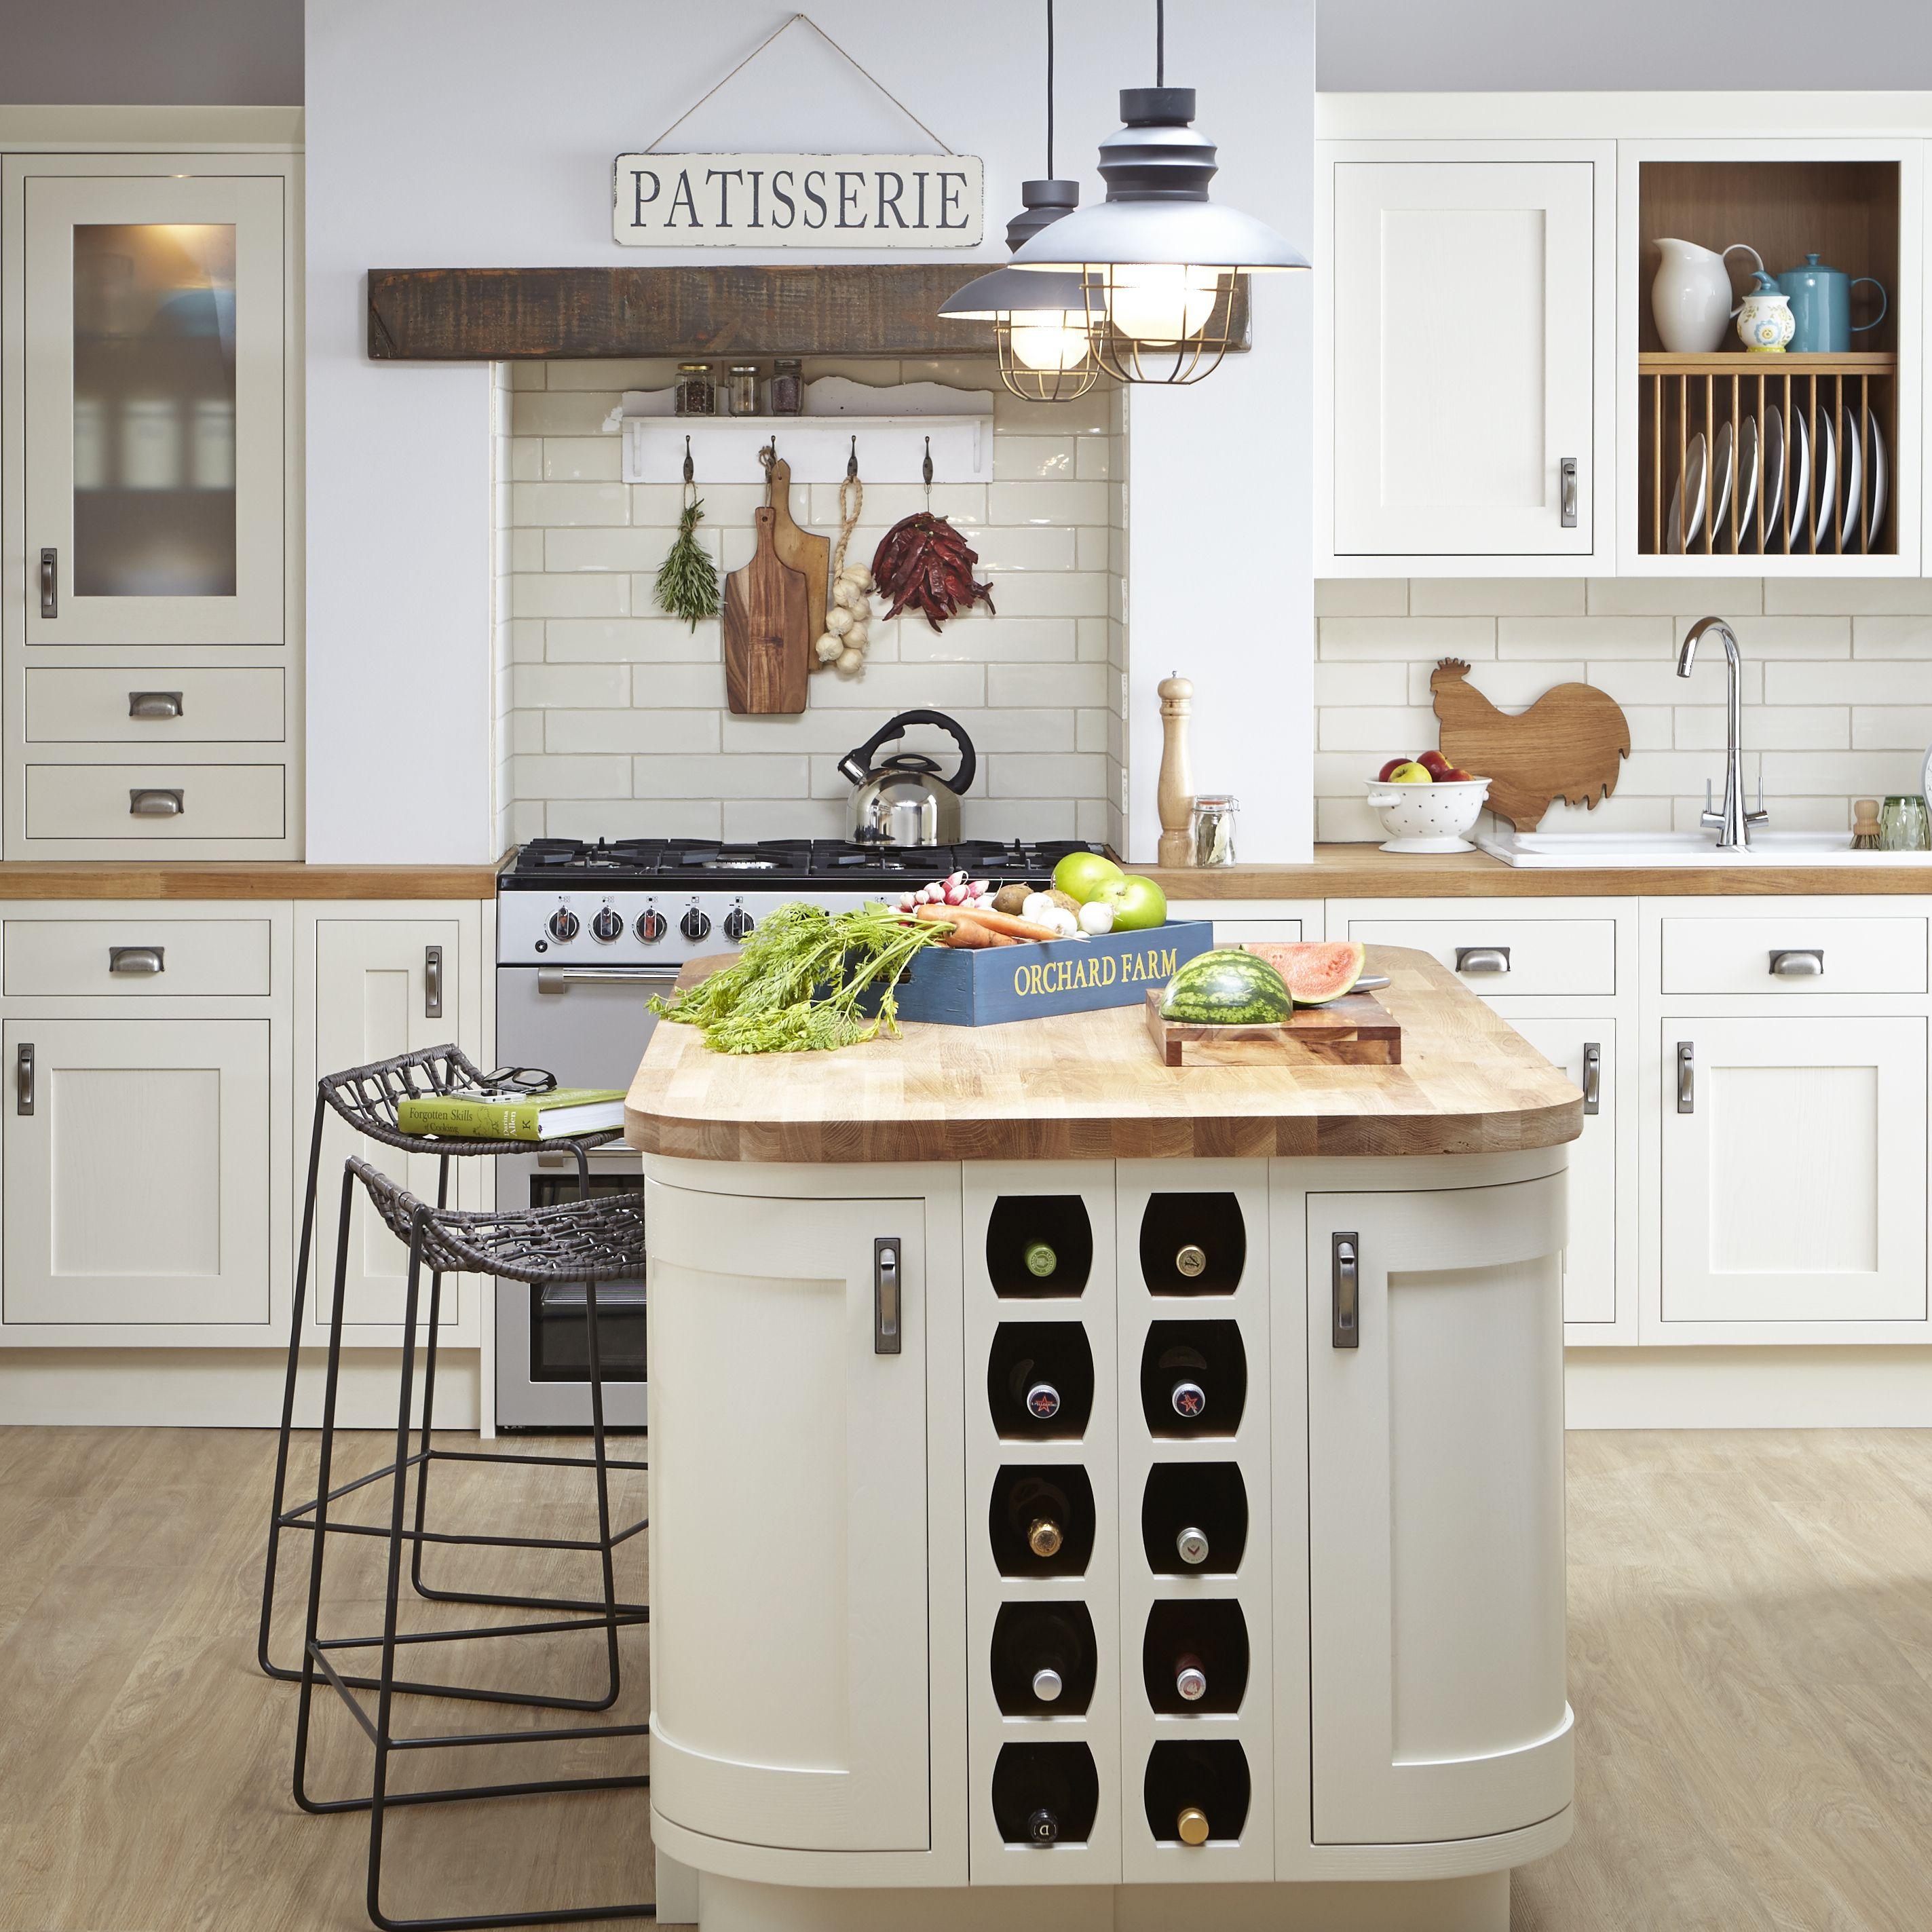 Country Kitchen country kitchen design ideas | help & ideas | diy at b&q